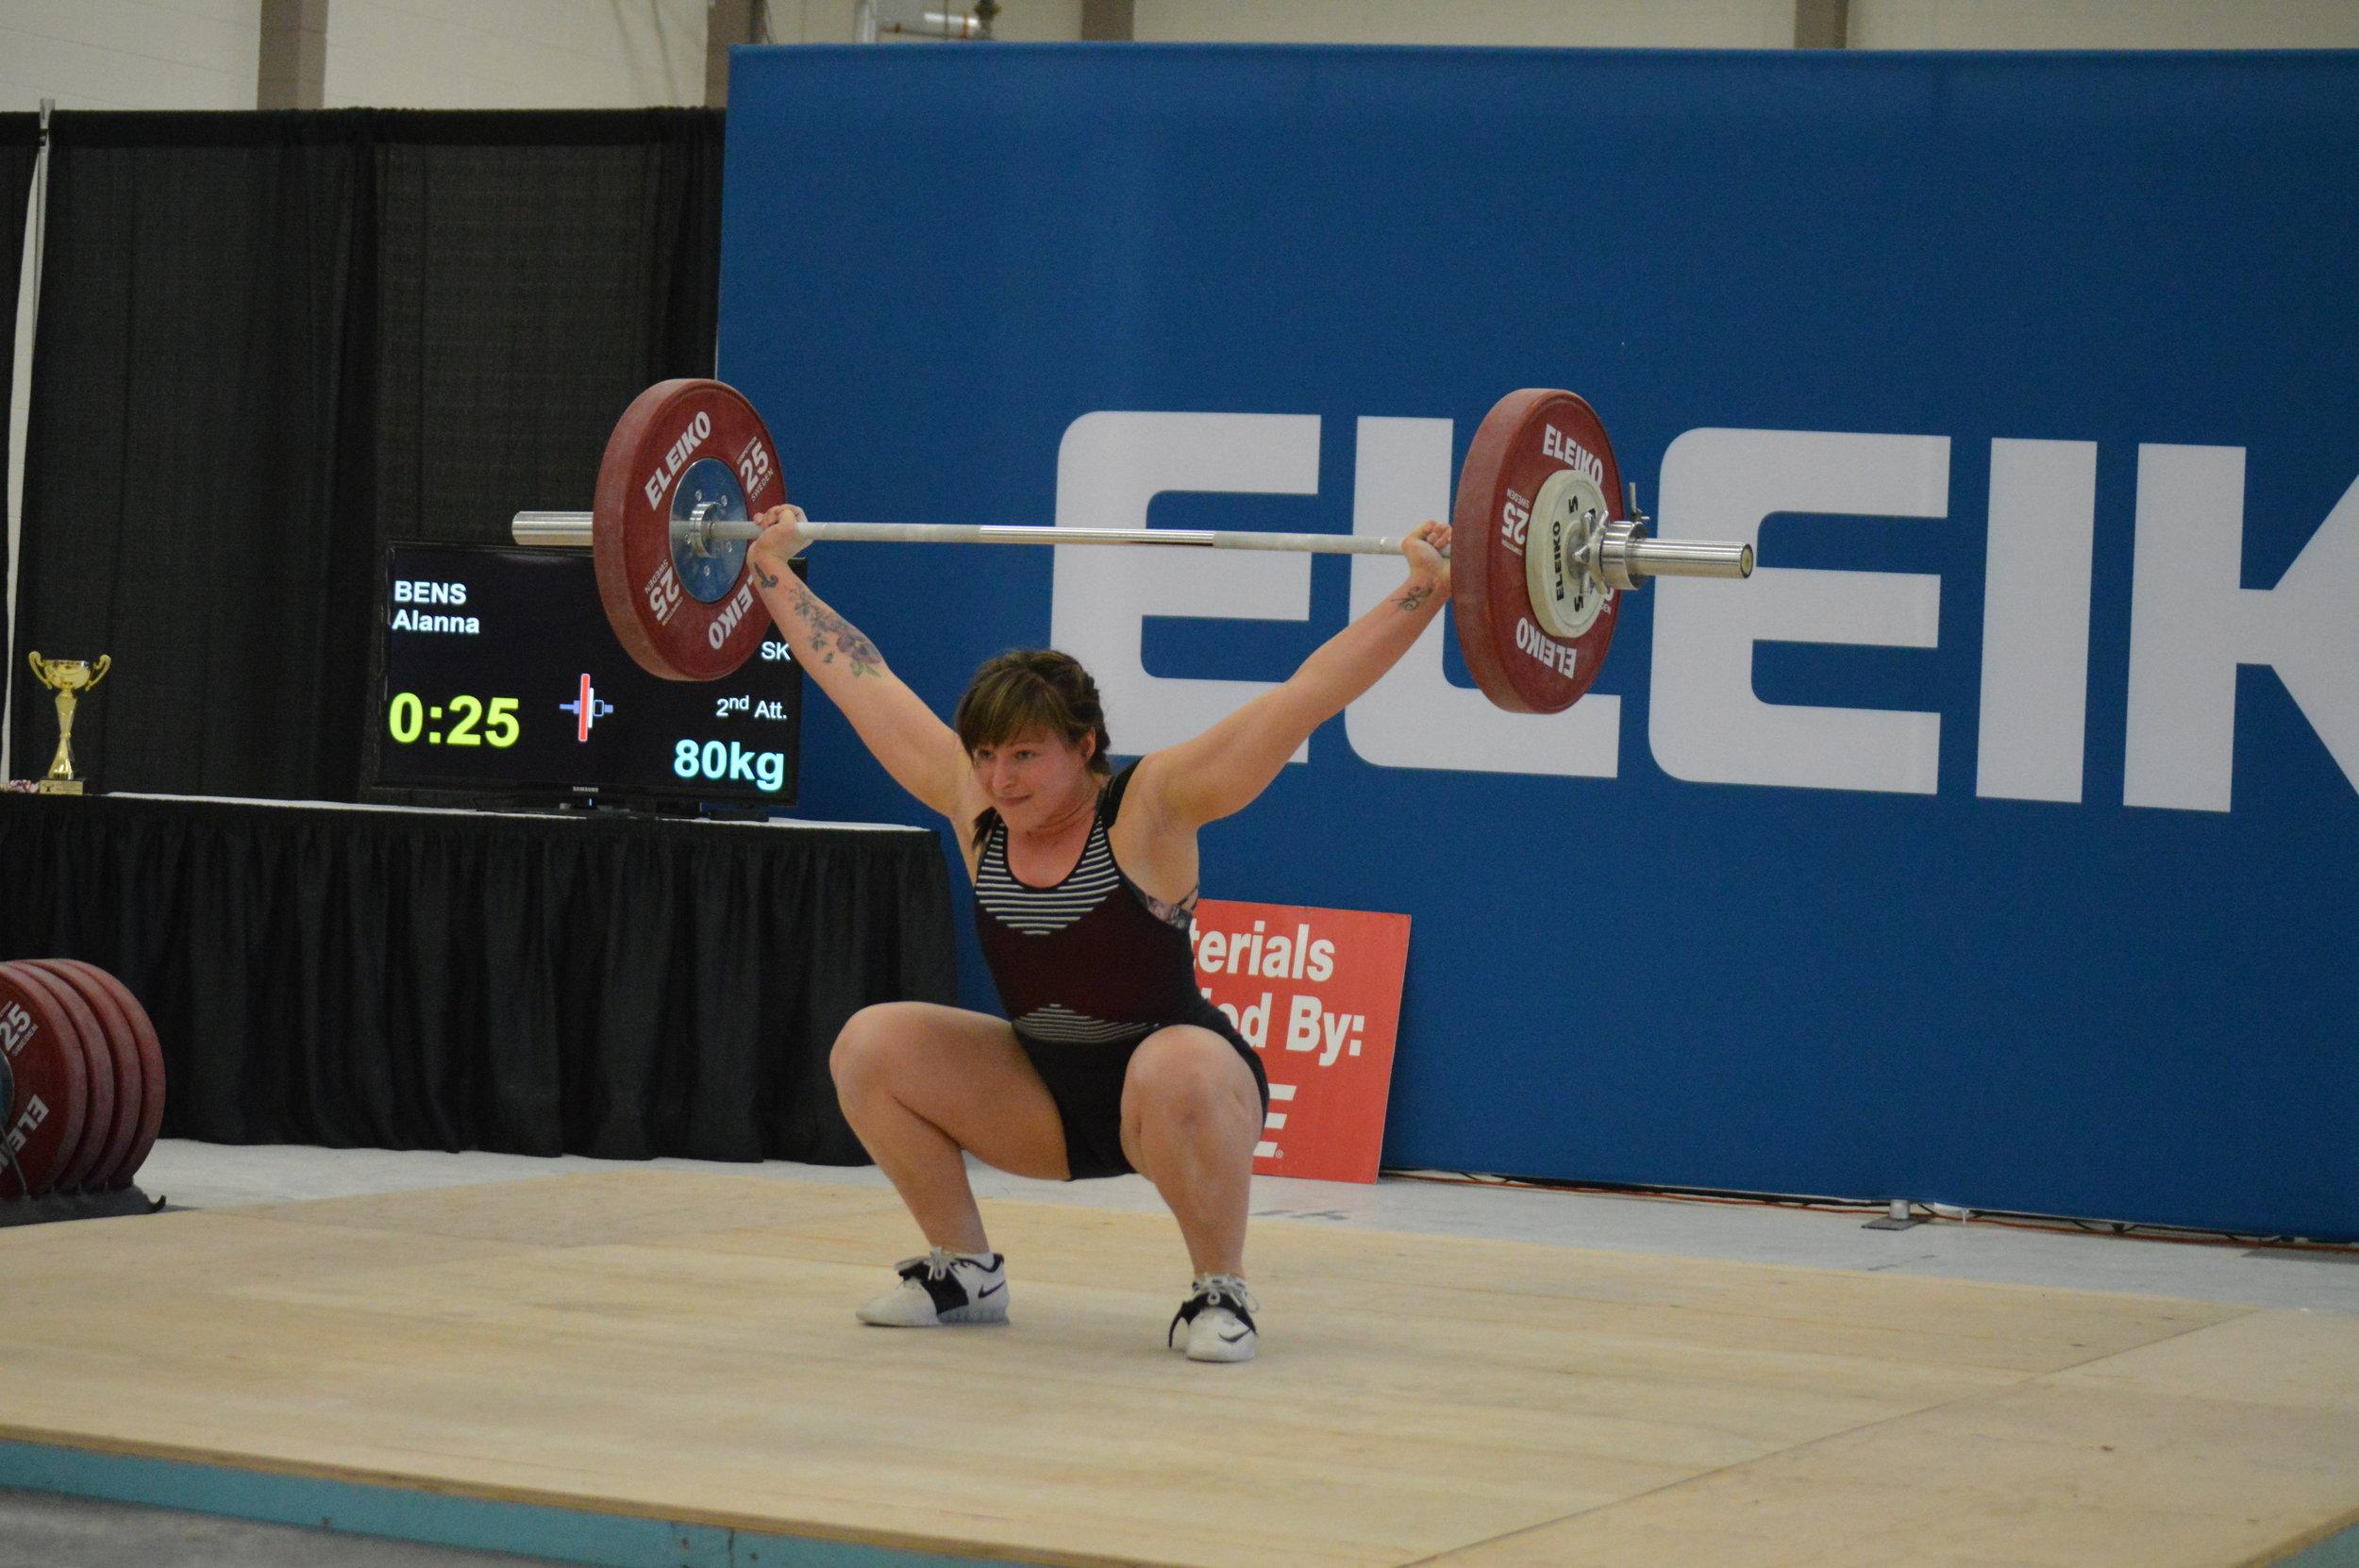 Alanna - snatch 80kg (7).JPG